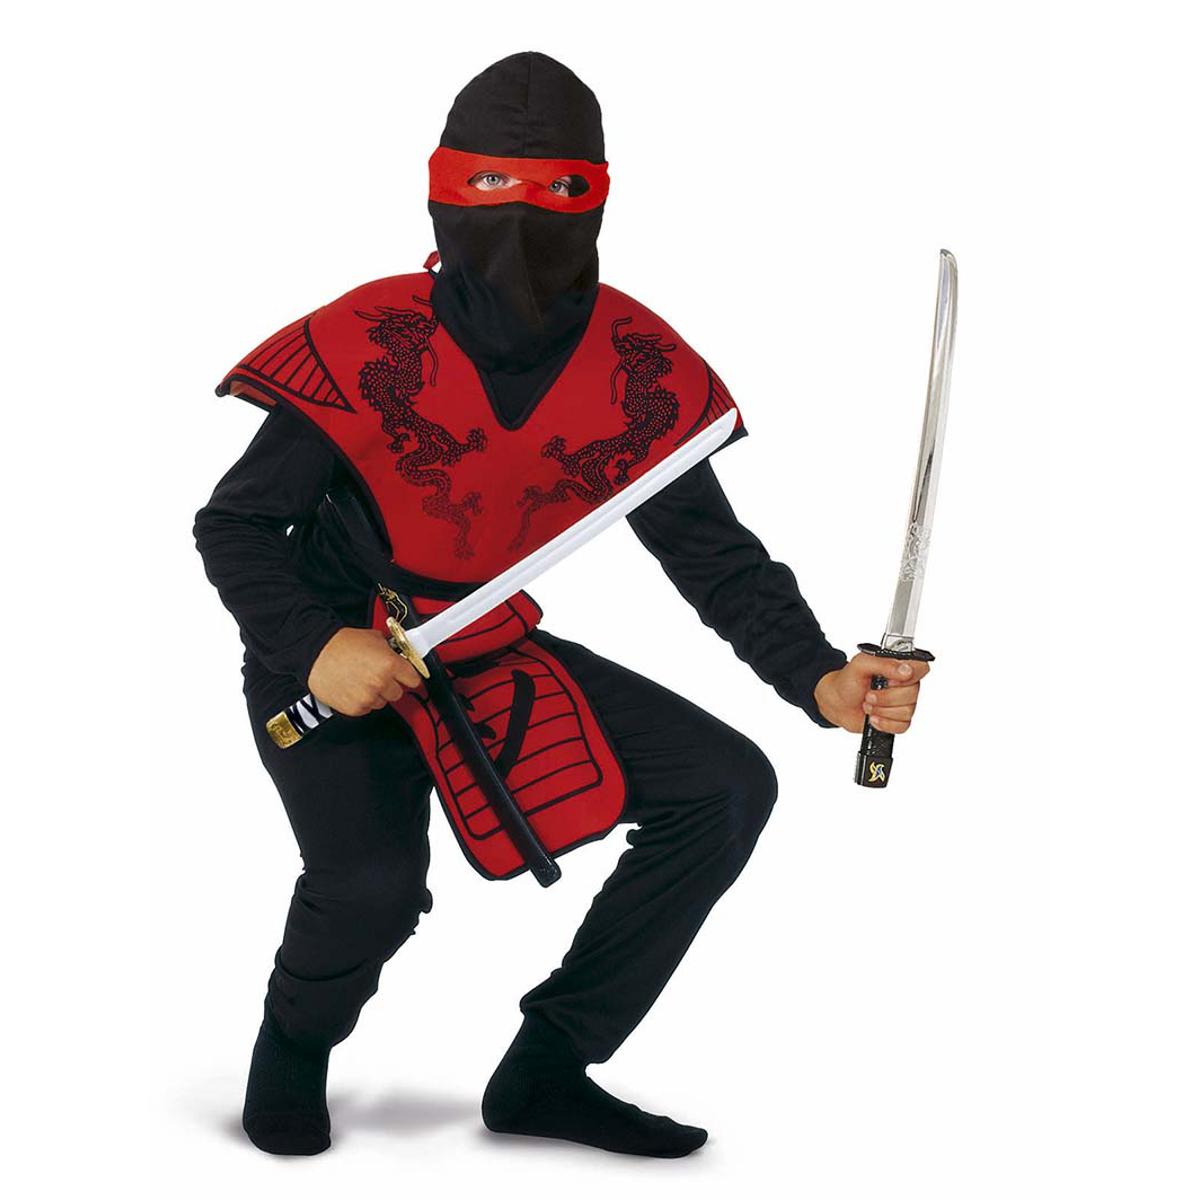 RIO RED NINJA FIGHTER